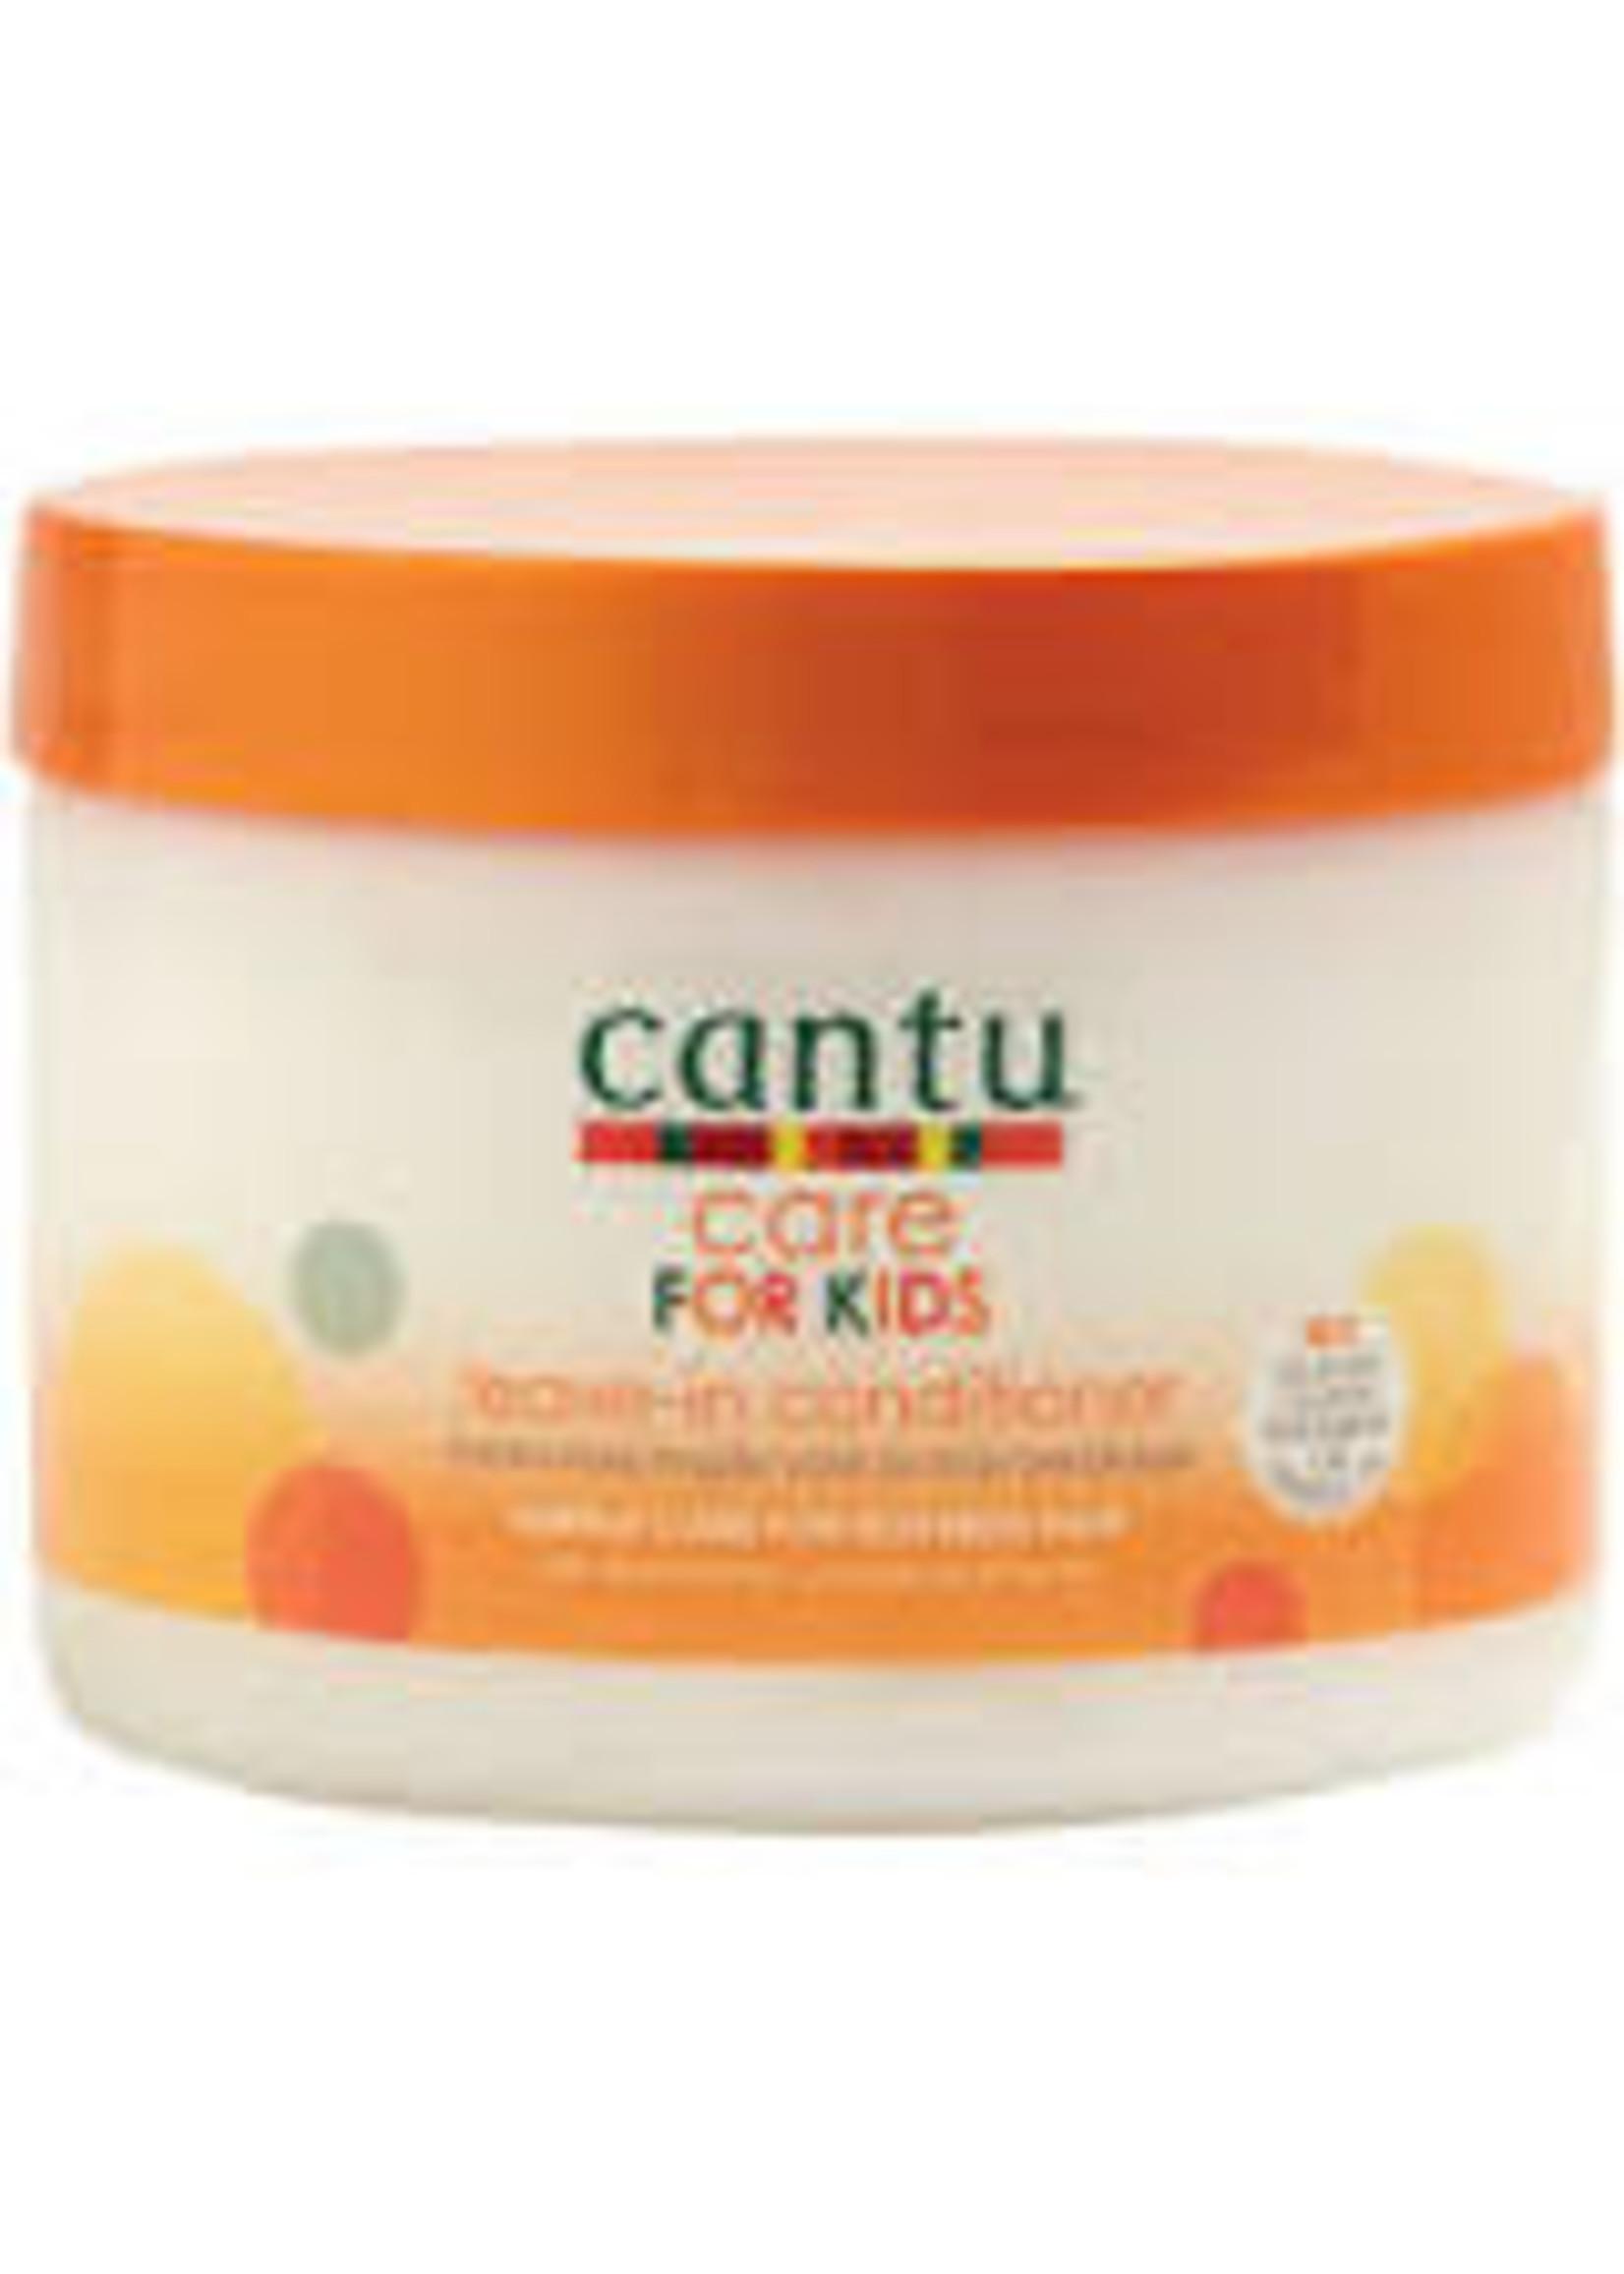 Cantu Care Kids Leave In Conditioner